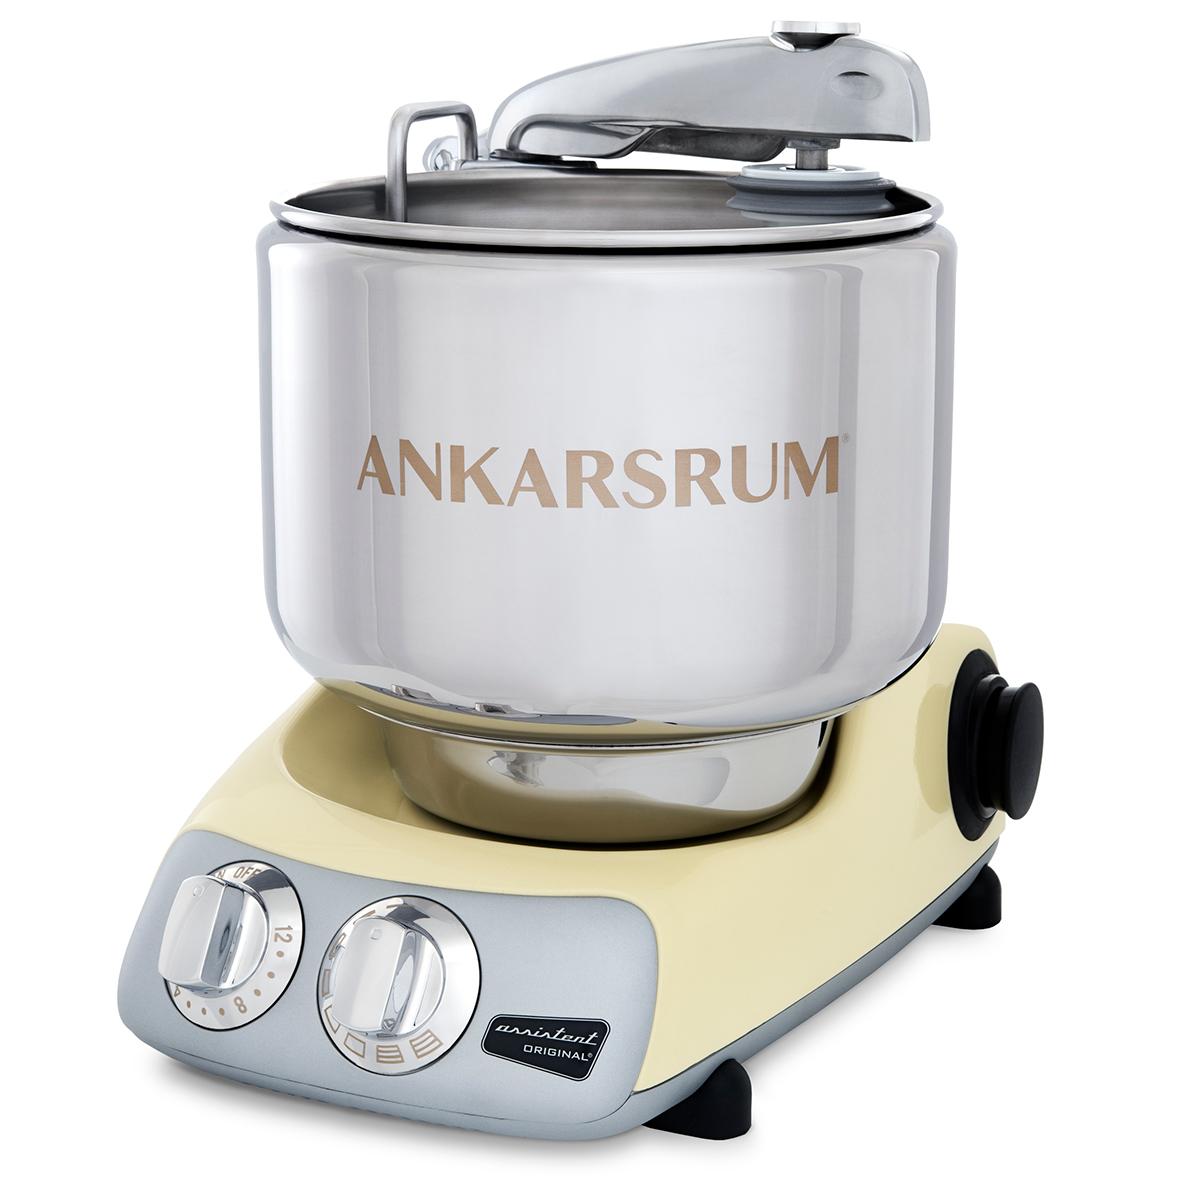 Image of   Ankarsrum køkkenmaskine Assistent Original AKM 6230 C - Cremegul